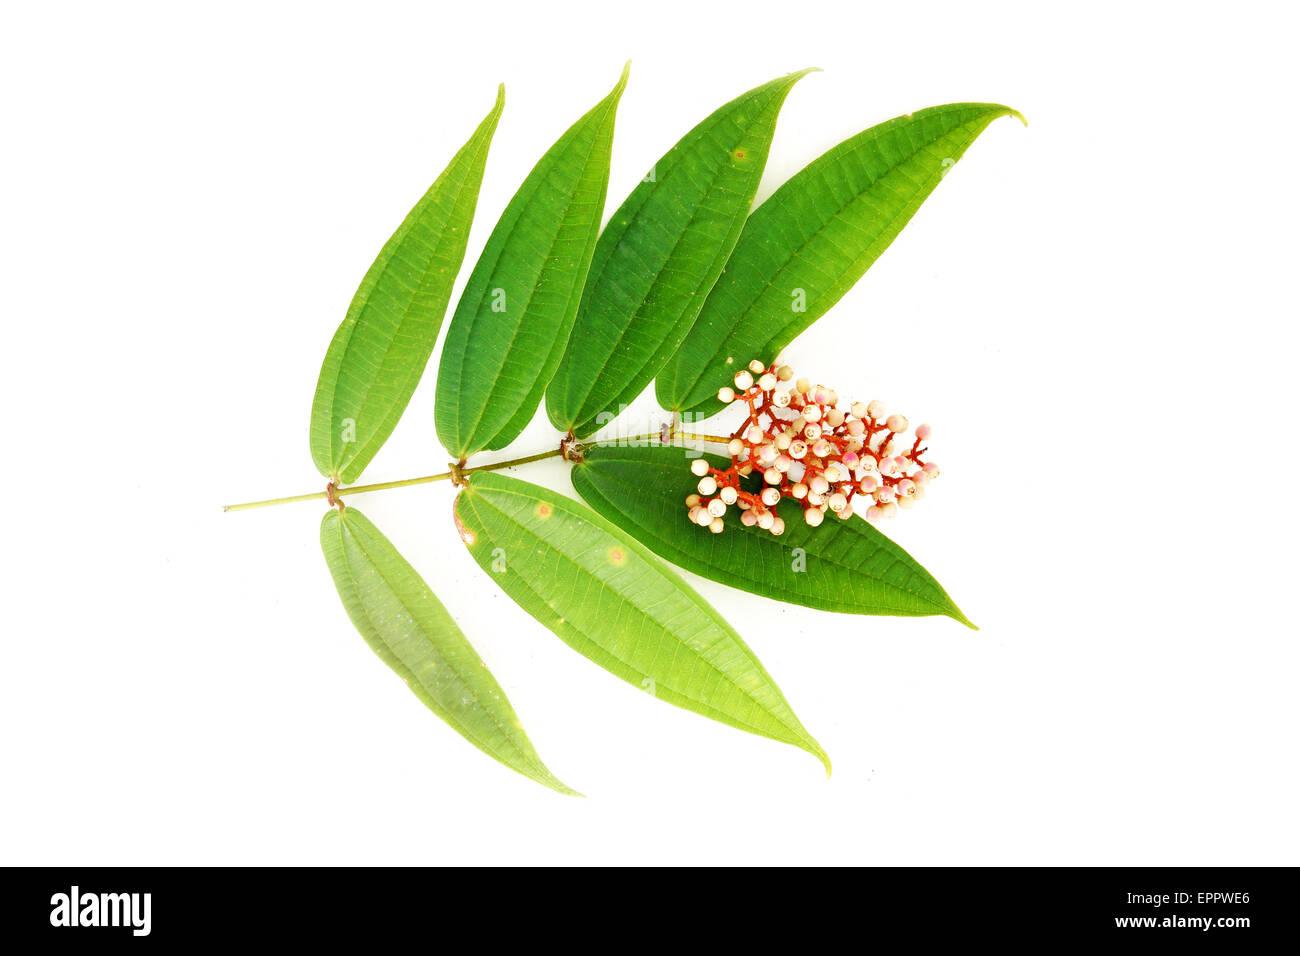 Diplectria glabra Melastomataceae vine - Stock Image